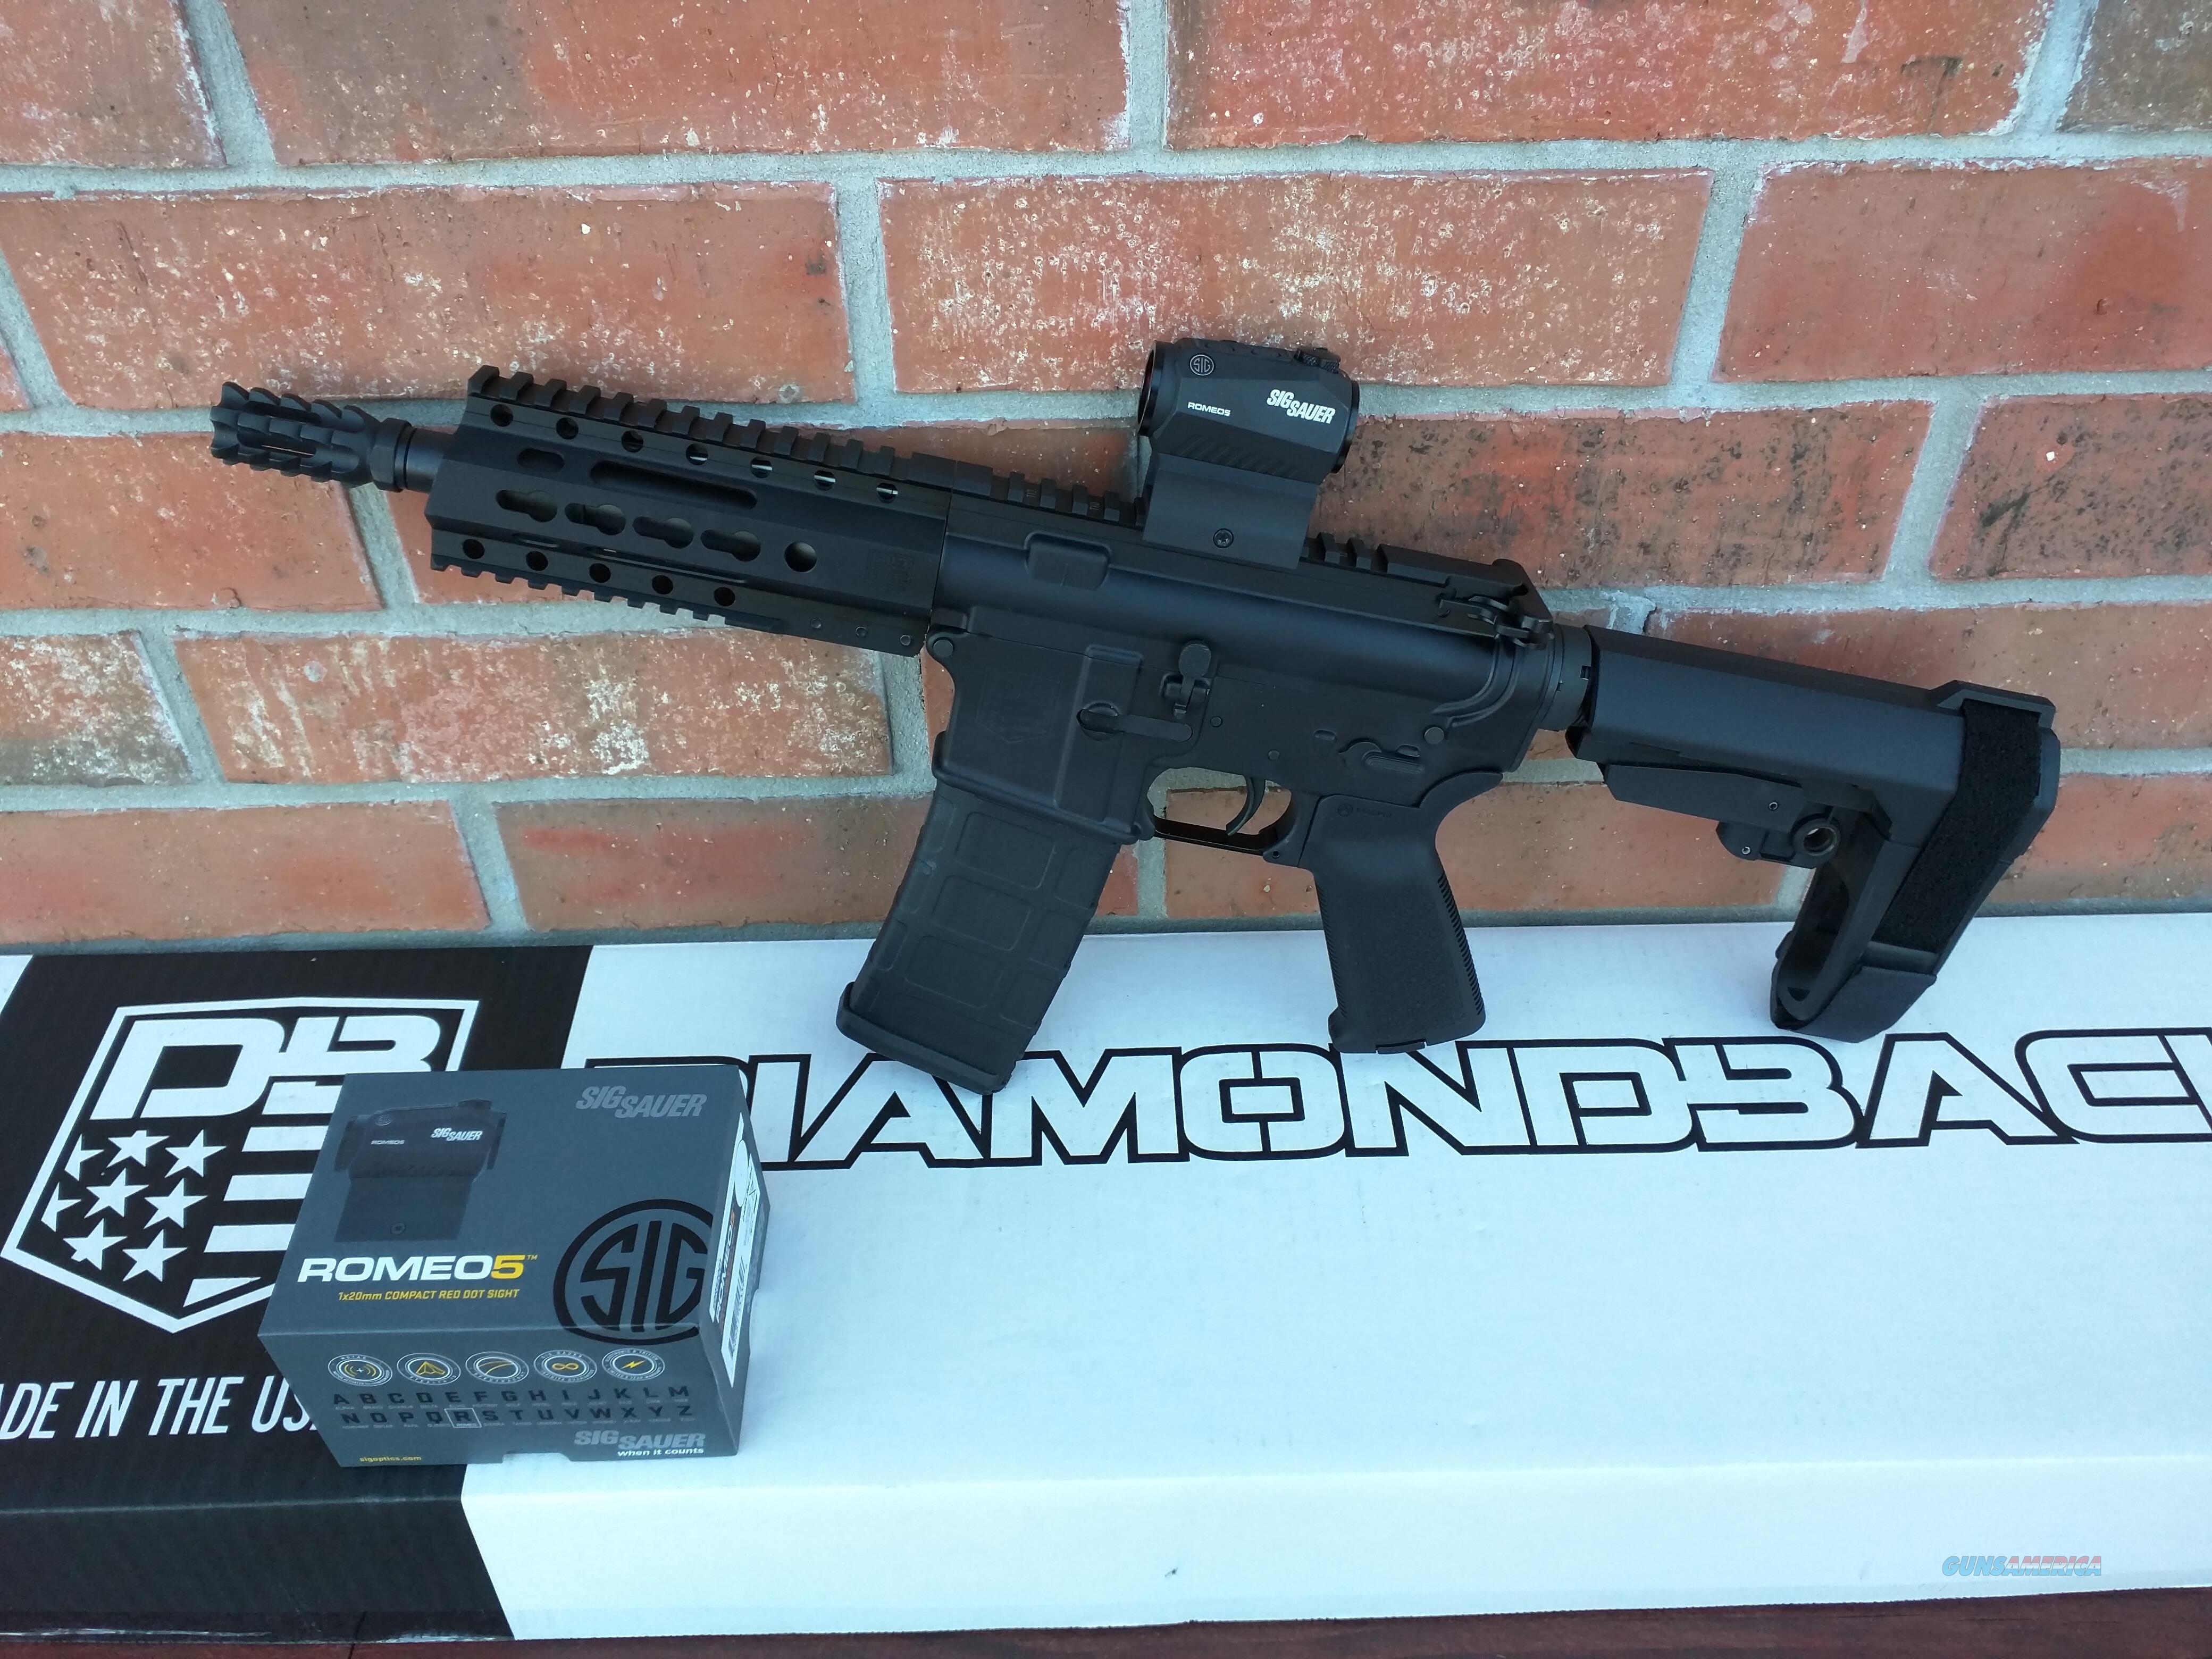 "Diamondback  DB 15 AR 15 AR15 Pistol 7.5"" SIG SAUER Red Dot SB Tactical SBA3 Pistol Adj Brace 223/5.56 30 rd NIB Alum Rail Muzzle Brake Lifetime Warranty FREE LAYAWAY!!  Guns > Rifles > AR-15 Rifles - Small Manufacturers > Complete Rifle"